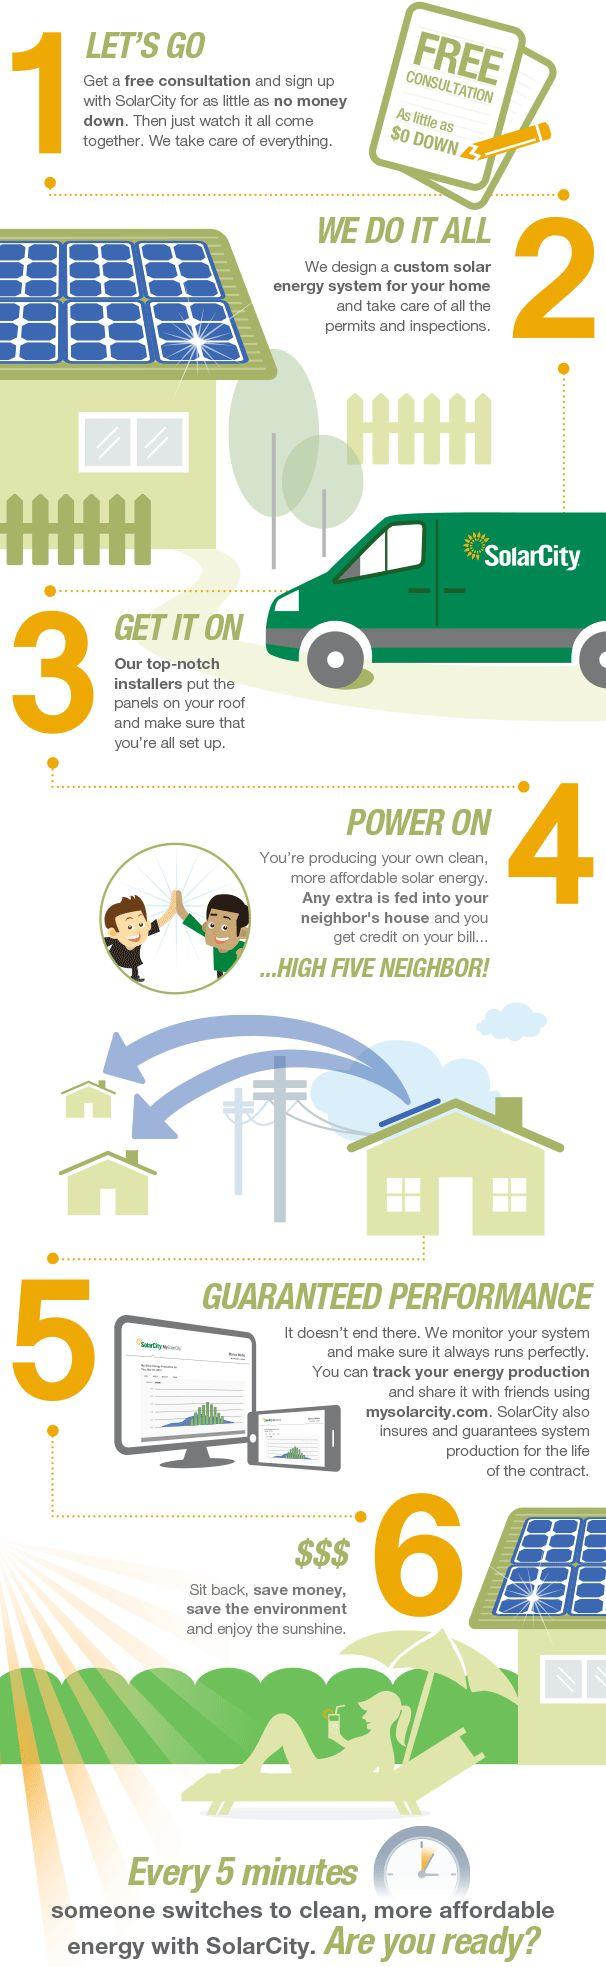 Best 25+ Solar Panel Cost Ideas On Pinterest | Solar Power Cost, Solar Panel  Efficiency And Cheap Solar Panels